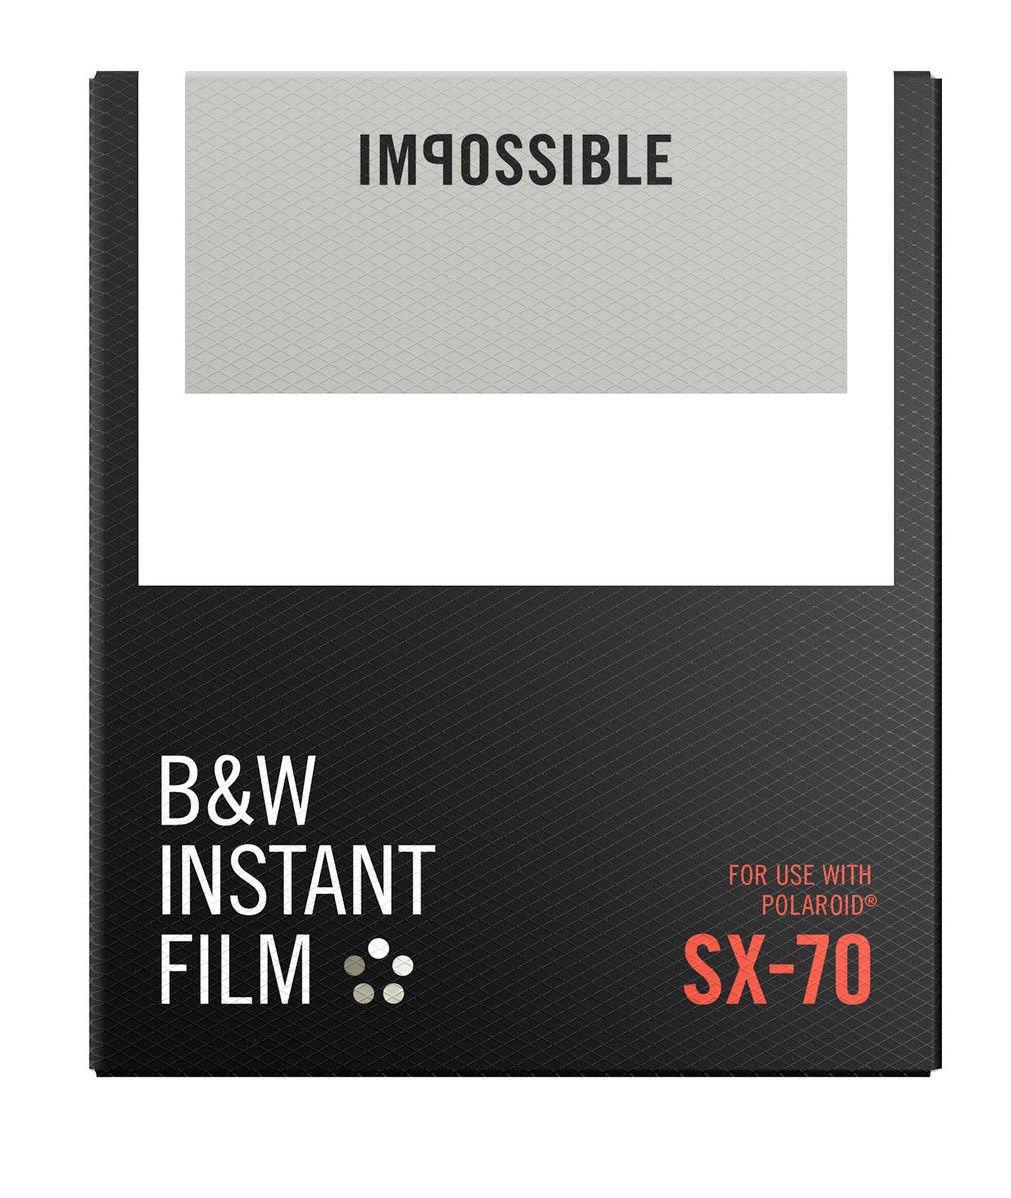 IMPOSSIBLE černobílý film pro Polaroid SX-70/8 ks